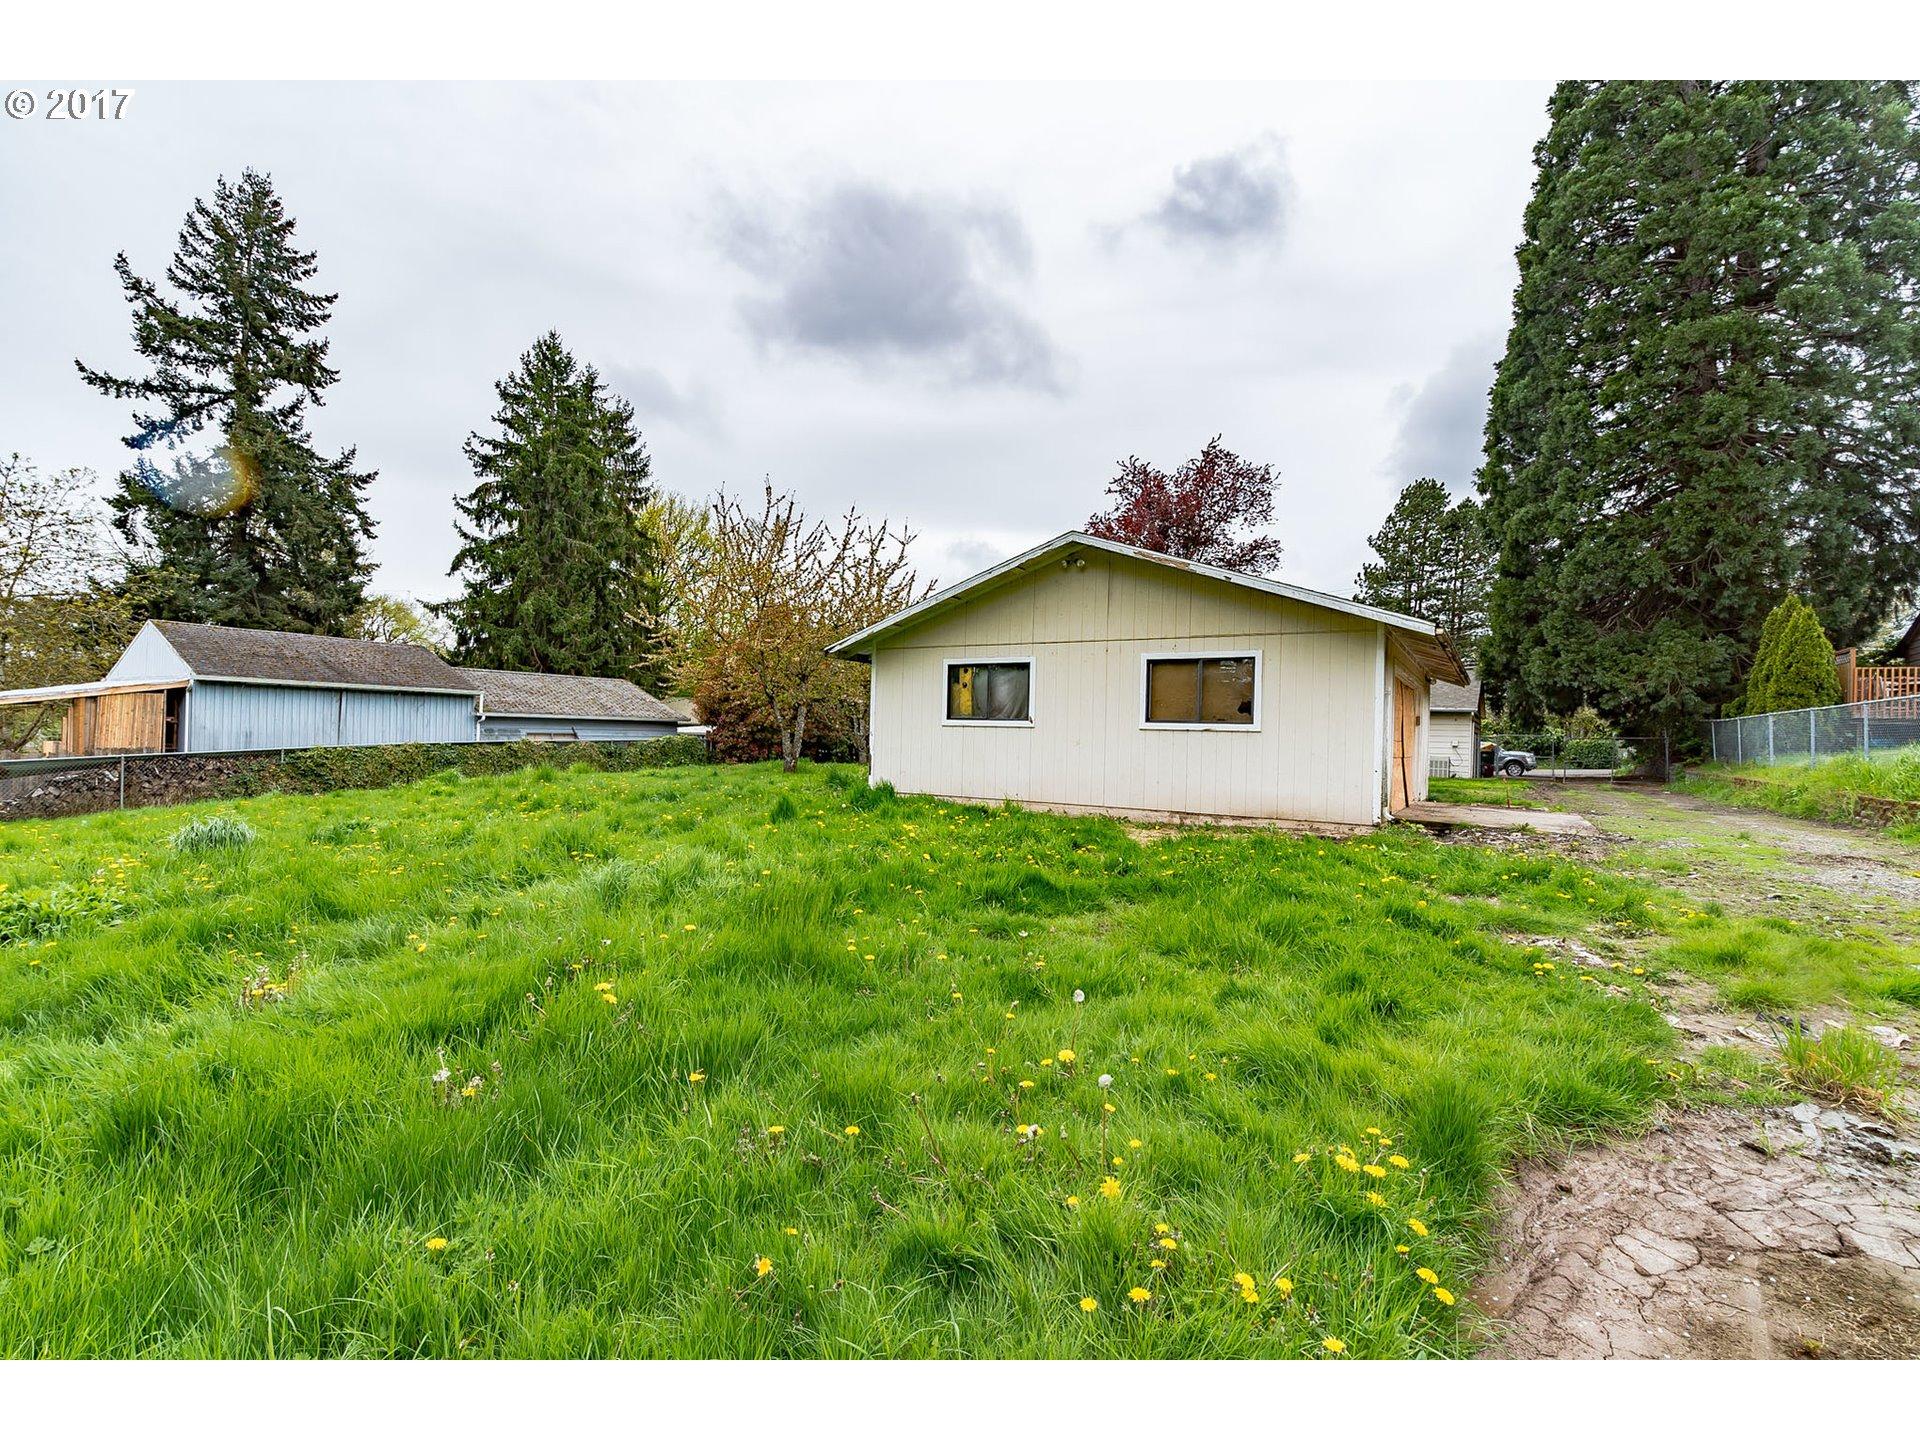 14050 SW BUTNER RD Beaverton, OR 97006 - MLS #: 17606644